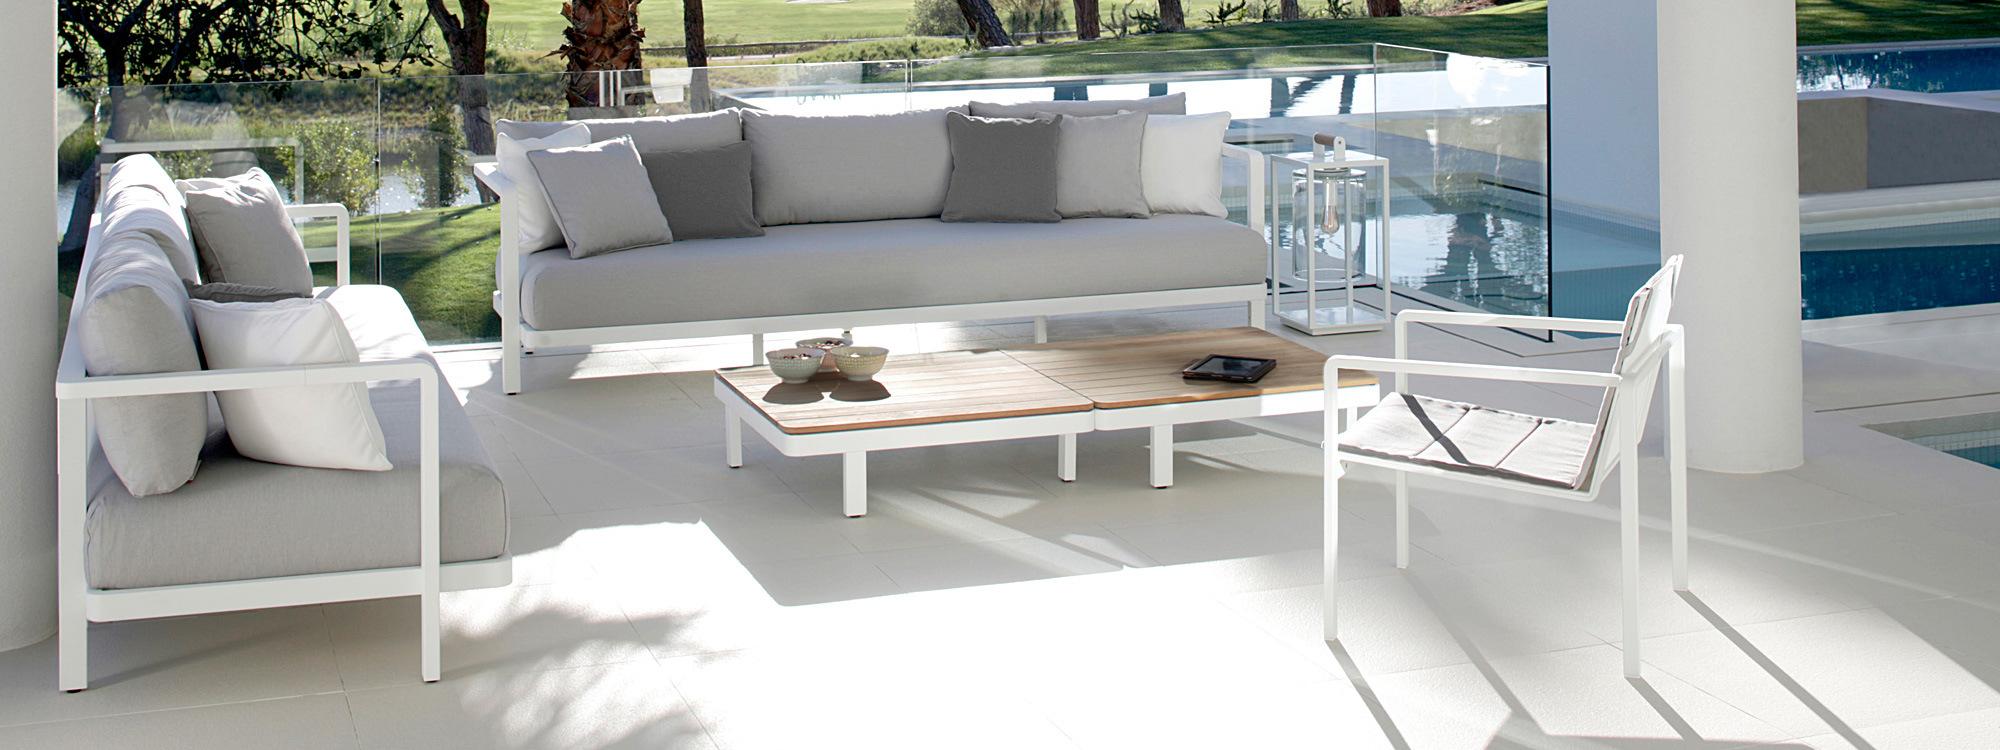 [Hot Item] Leisure Hotel / Home Modern Interior Decoration Rattan Sofa  Cover Leisure Sofa Garden Furniture